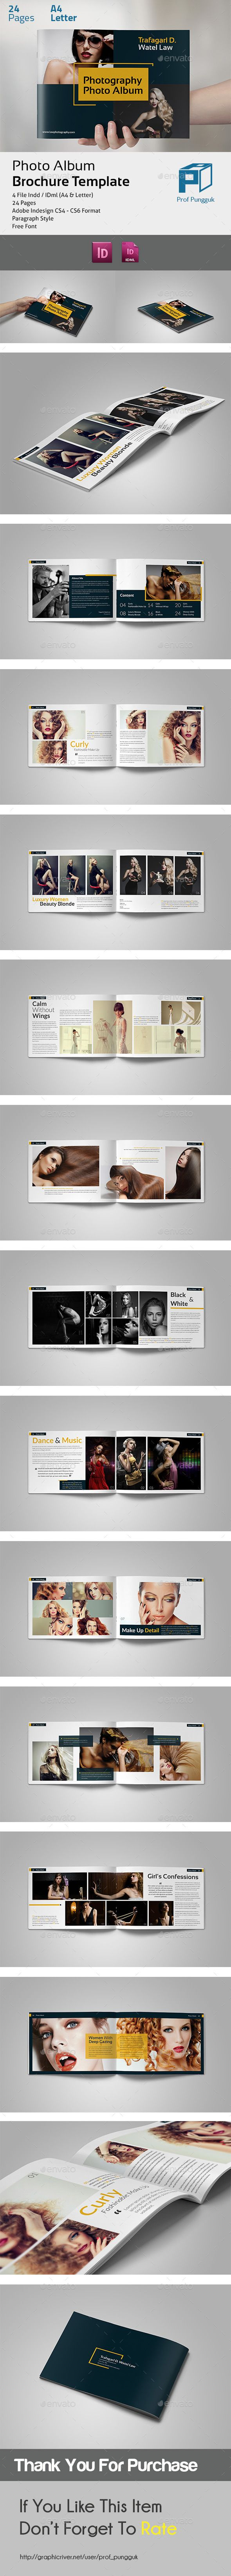 Modern Photo Album vol.2 - Portfolio Brochure Template InDesign INDD. Download here: http://graphicriver.net/item/modern-photo-album-vol2/11704591?s_rank=1790&ref=yinkira